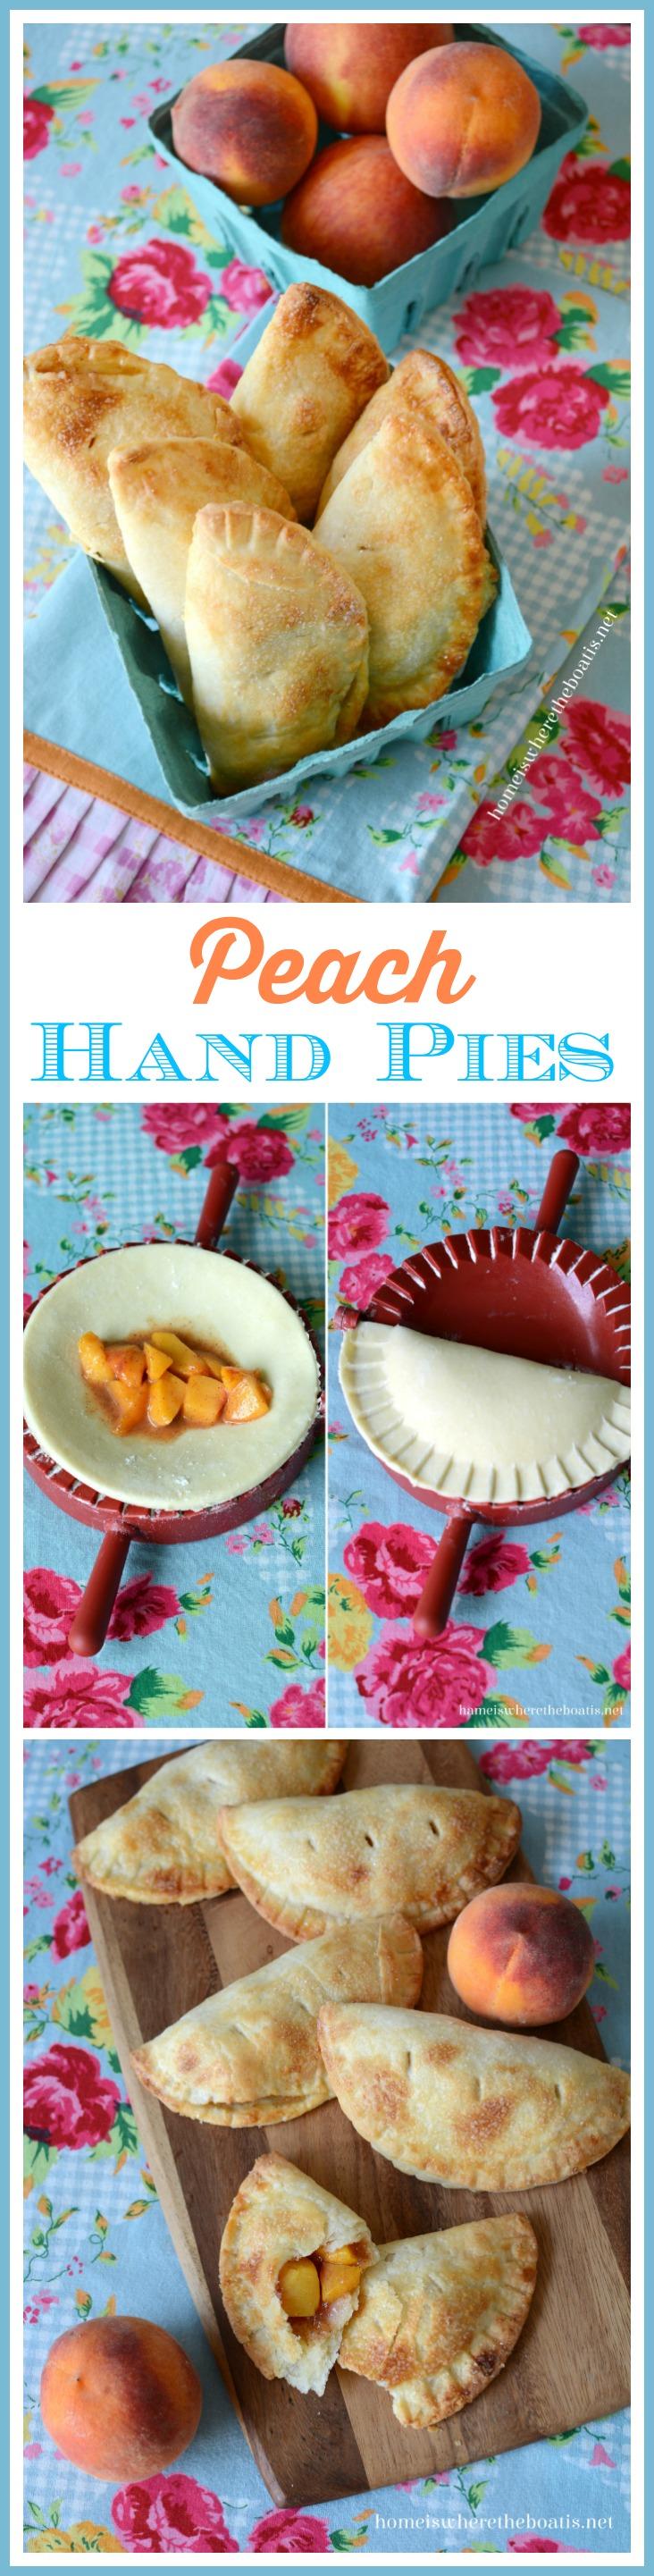 Peach Hand Pies with Cream Cheese Pastry Crust   homeiswheretheboatis.net #summer #dessert